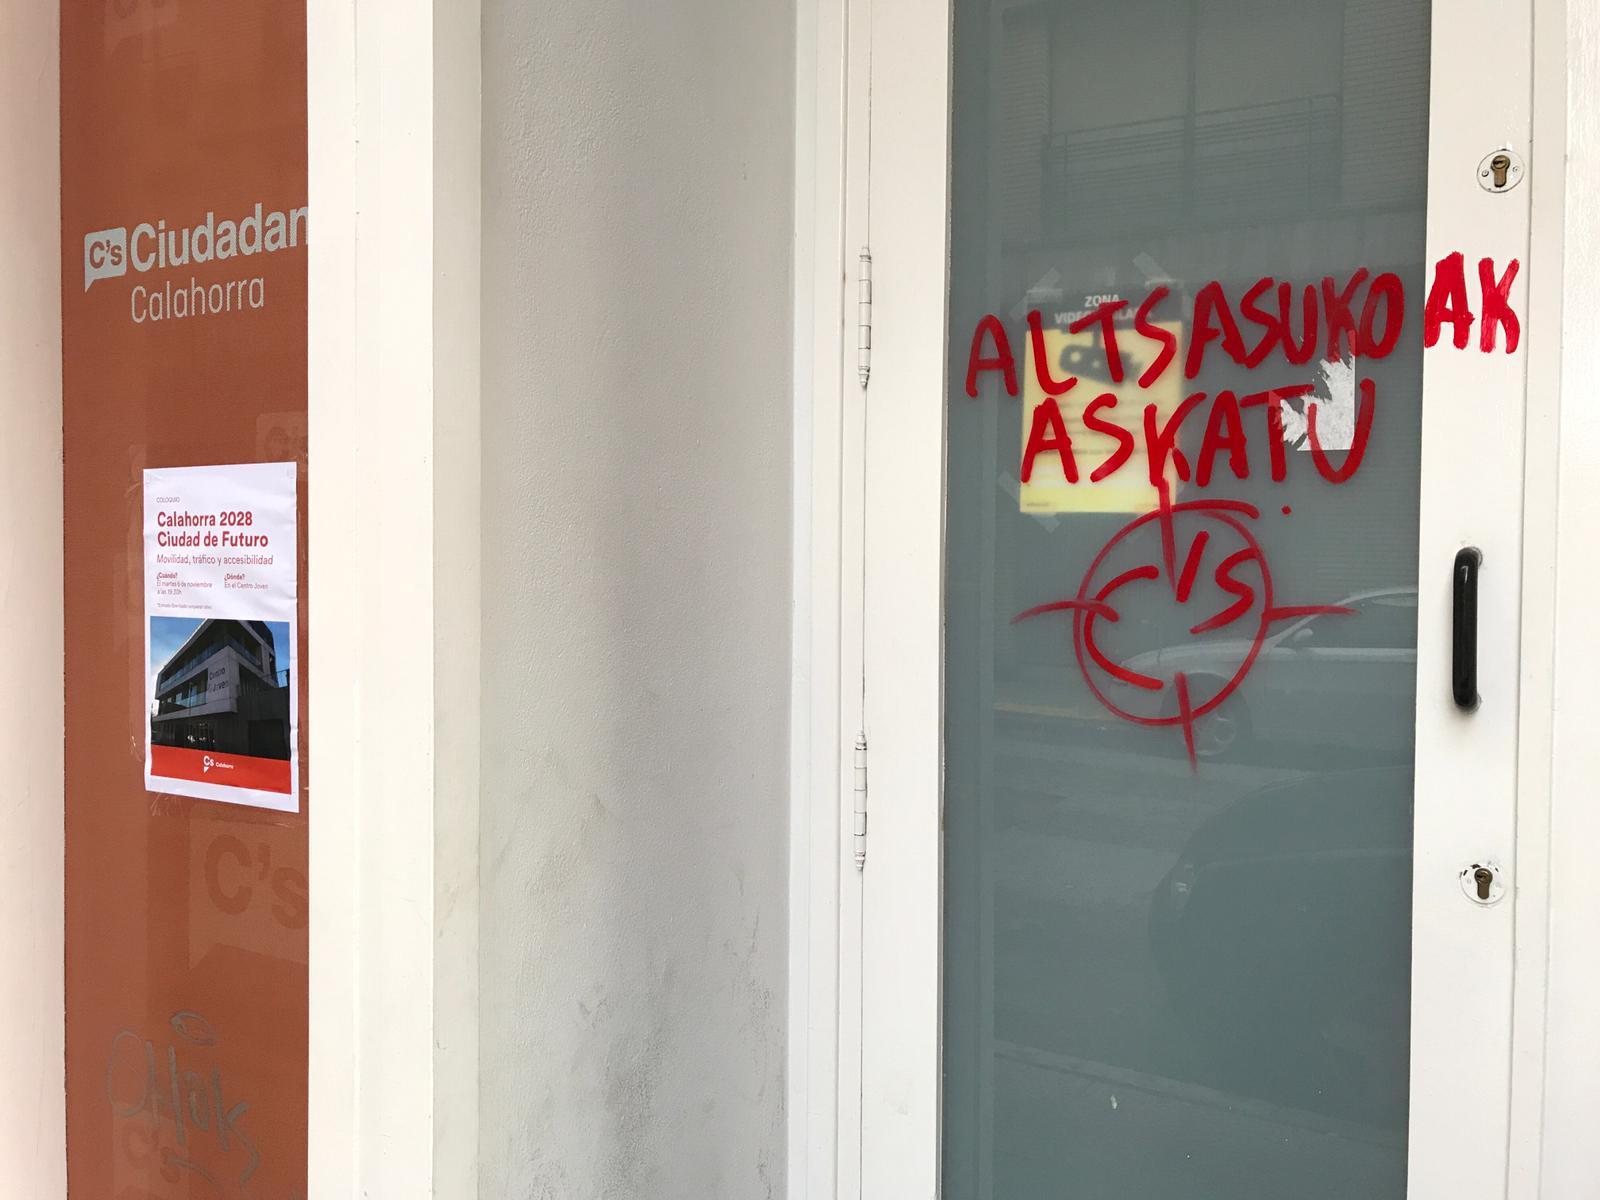 Independentistas atacan a sede de Cs en Calahorra con dianas de tiro por el Caso Alsasua